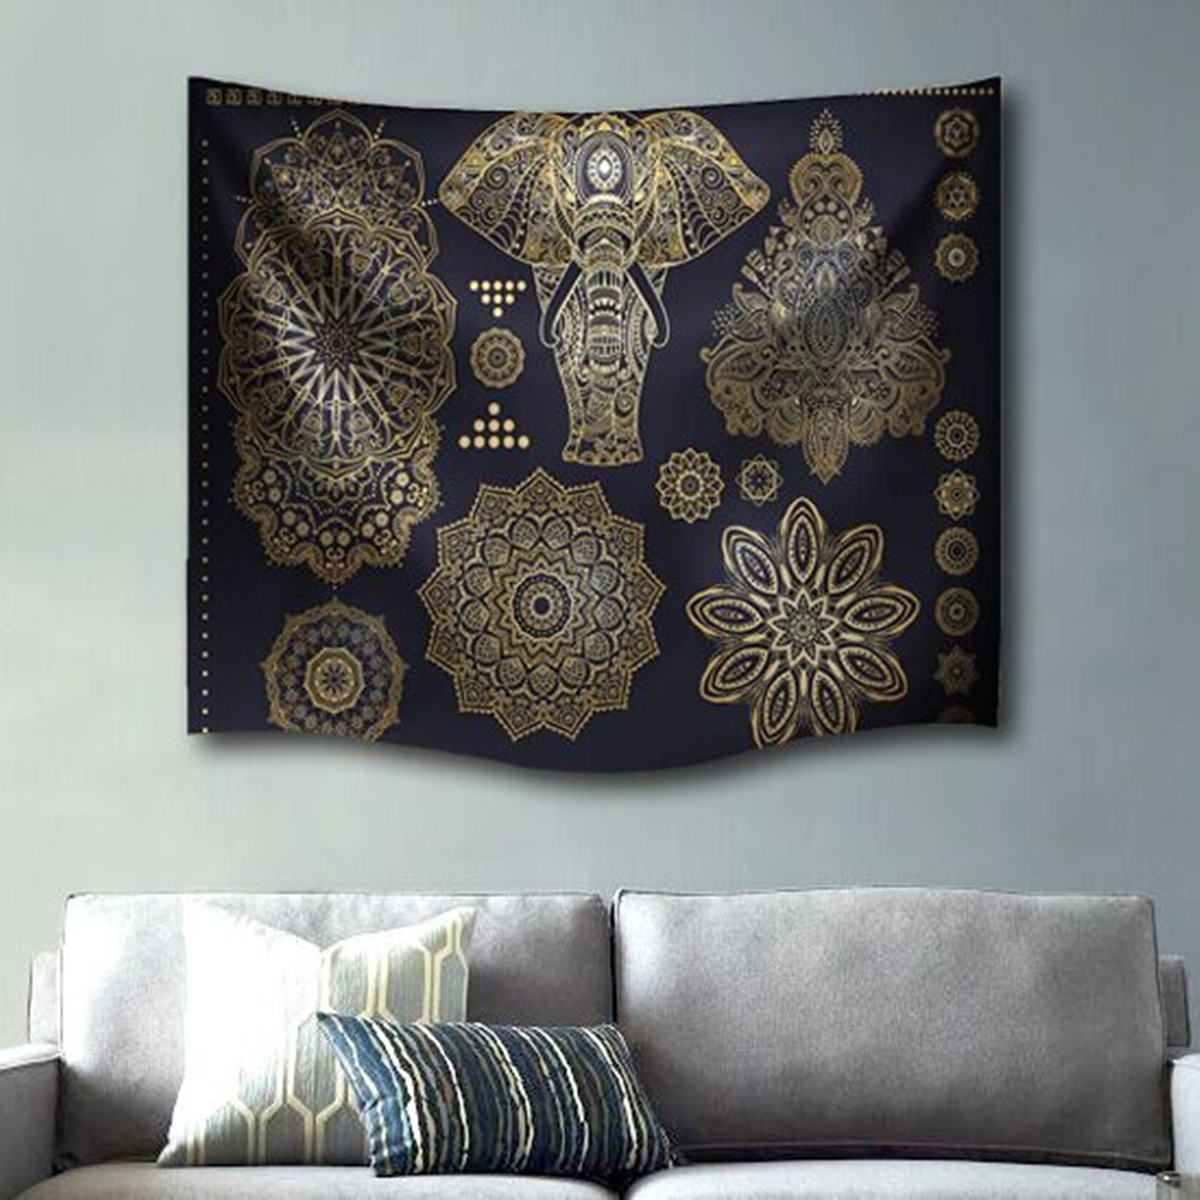 Indian Mandala Elephant Beach Towel Tapestry Wall Hanging Throw Dorm Bedspread Mat Decor